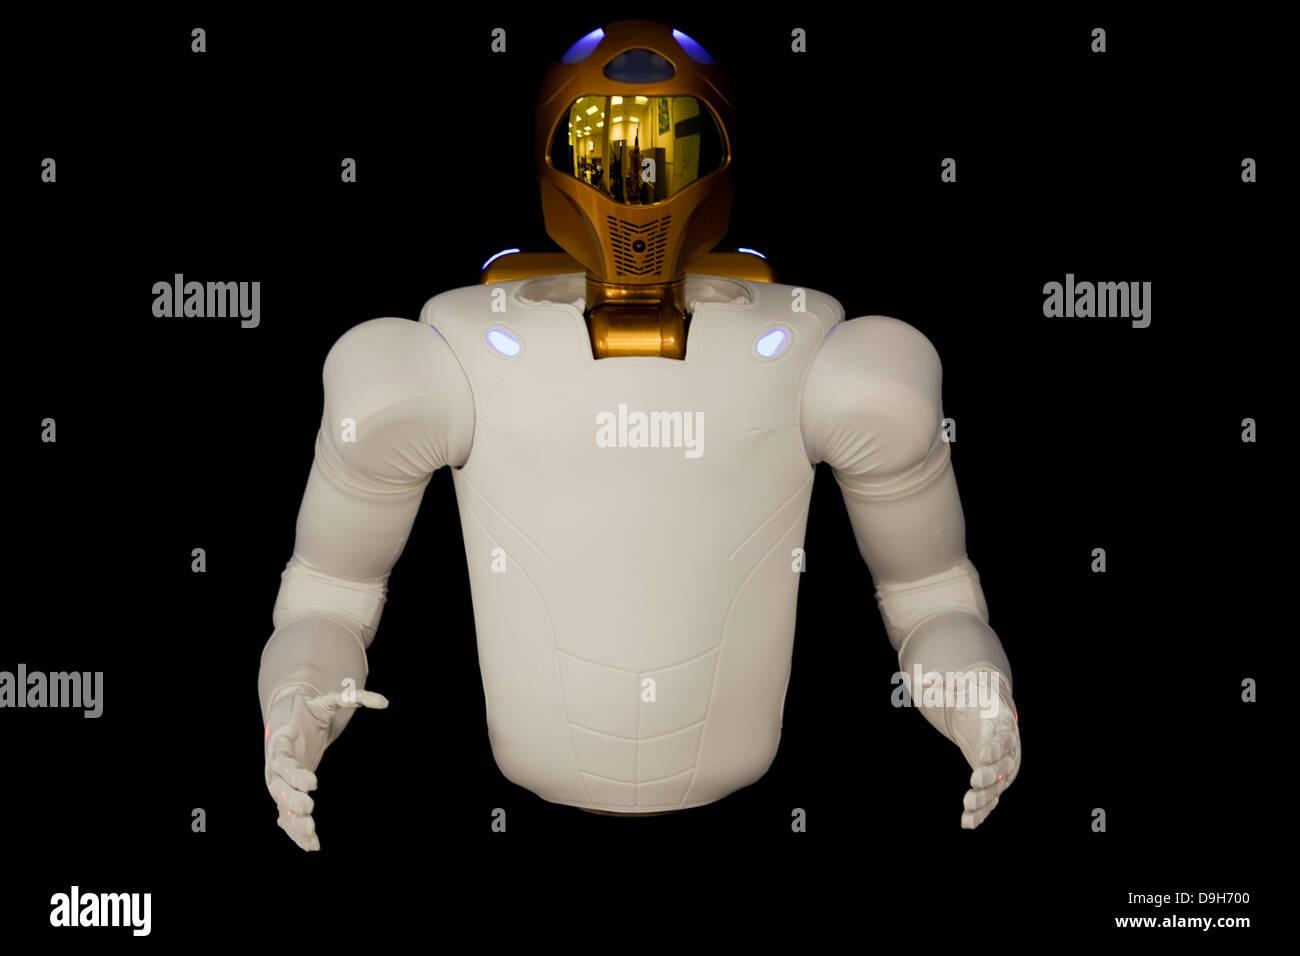 Robonaut 2, a dexterous, humanoid astronaut helper. - Stock Image